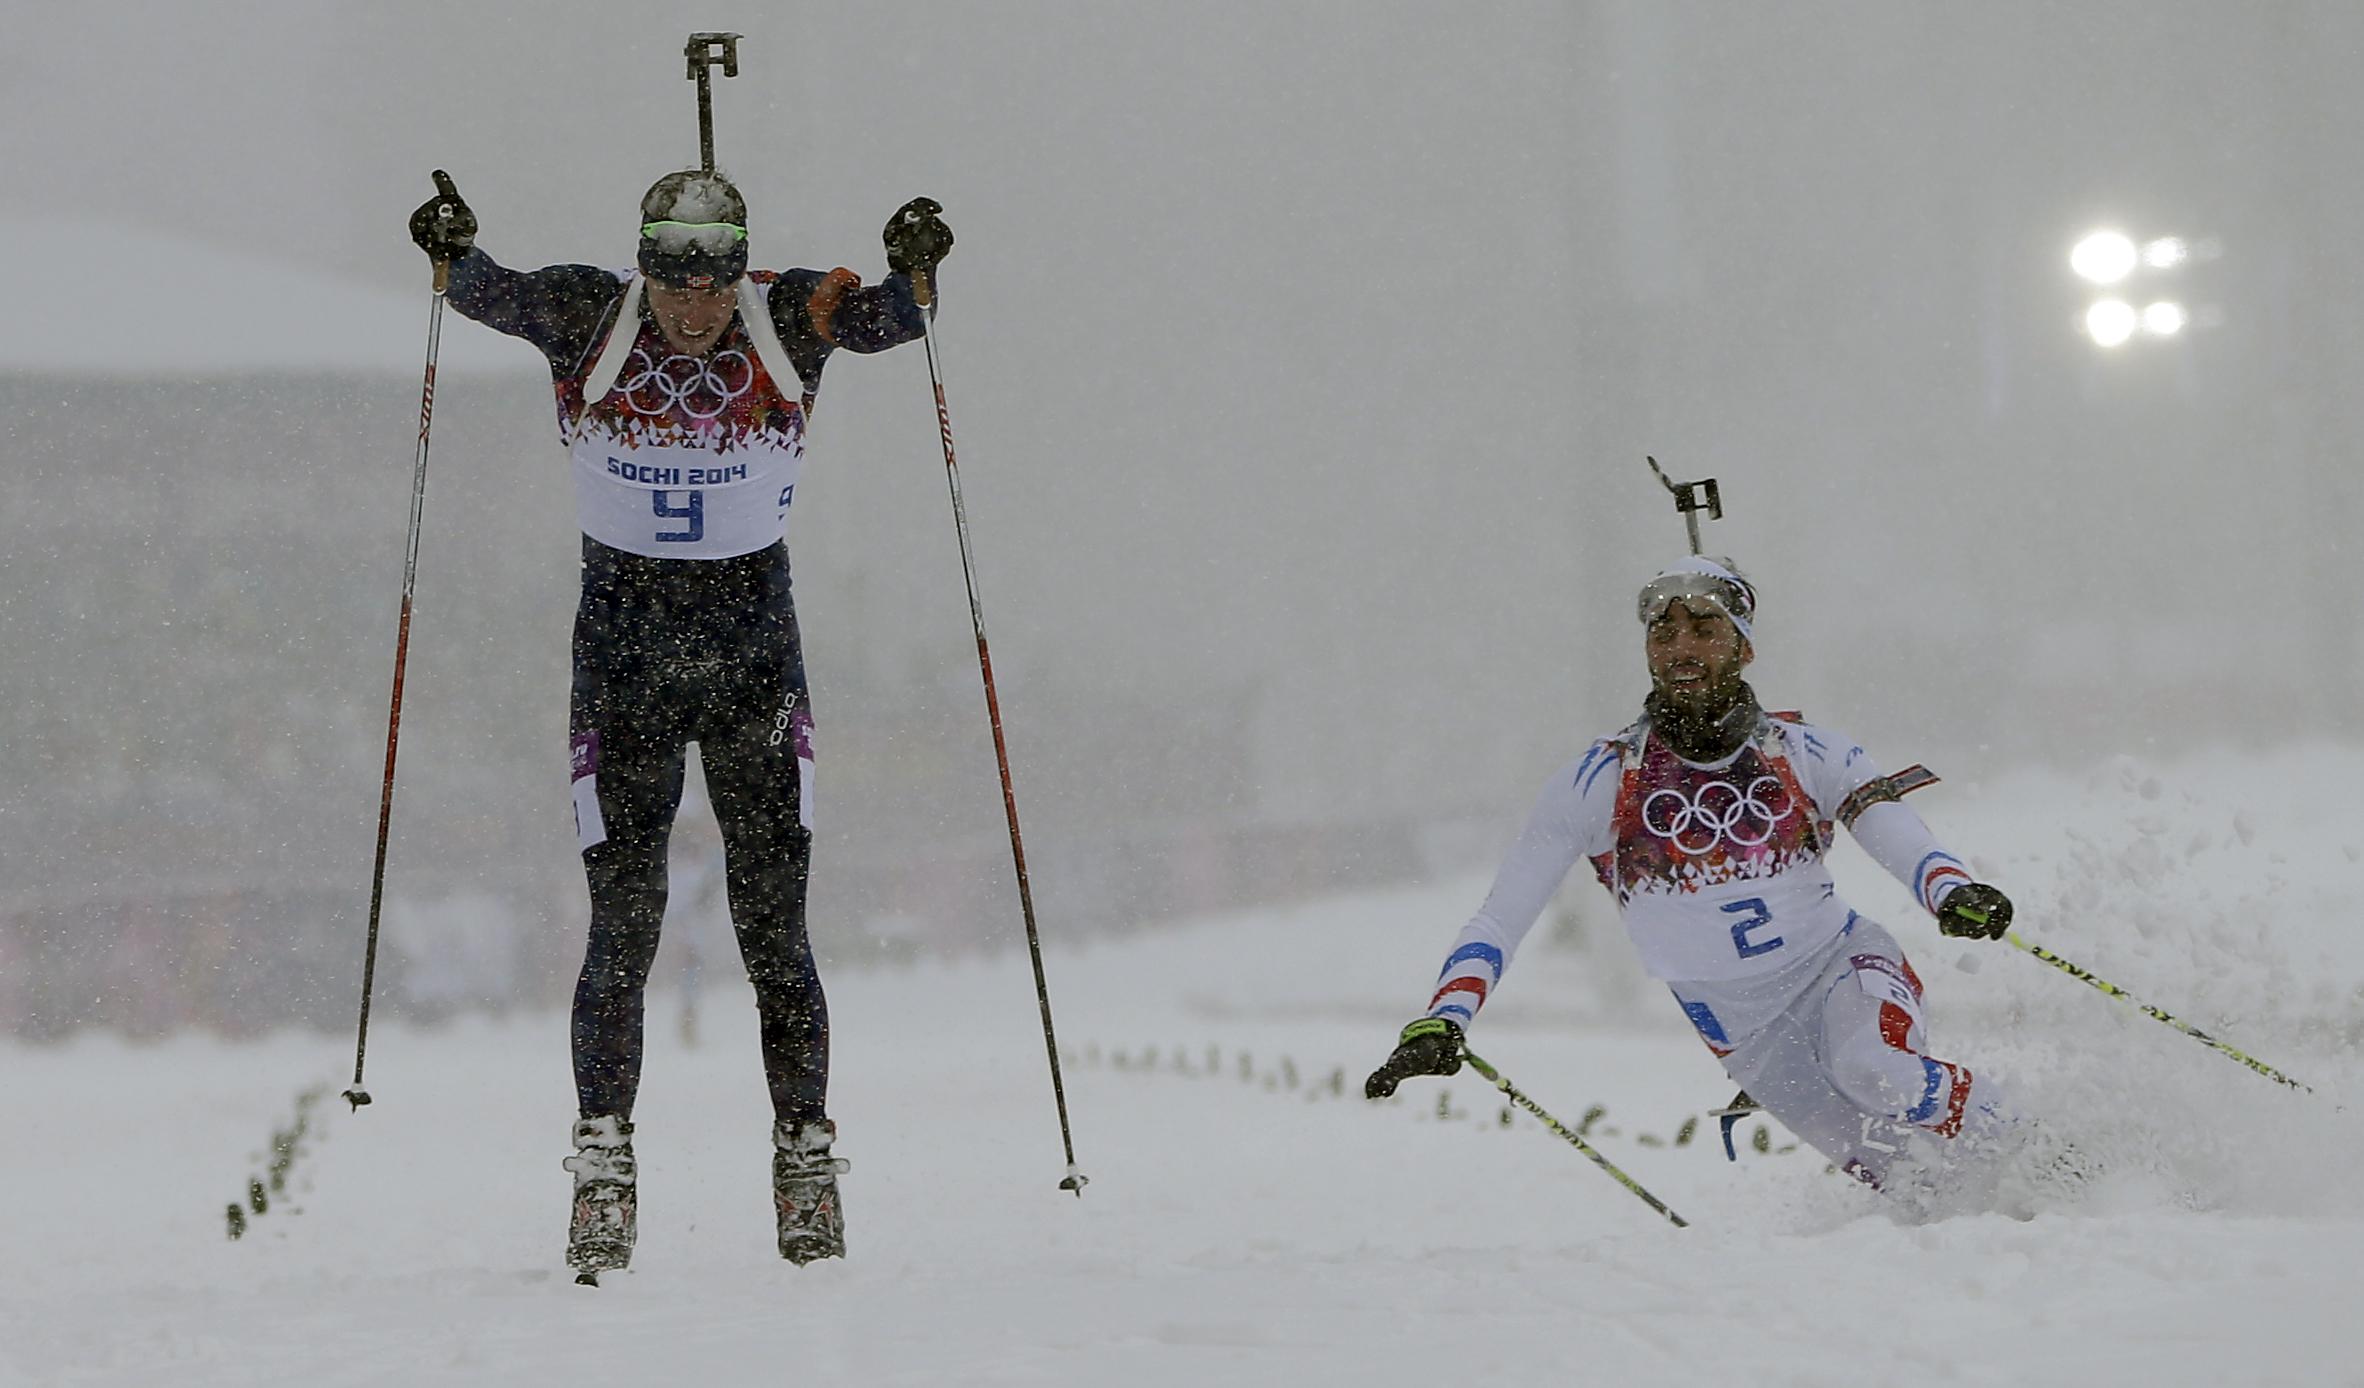 Norway's Emil Hegle Svendsen, left, outsprints France's Martin Fourcade to win the men's biathlon 15k mass-start, at the 2014 Winter Olympics, Tuesday, Feb. 18, 2014, in Krasnaya Polyana, Russia. (AP Photo/Felipe Dana)